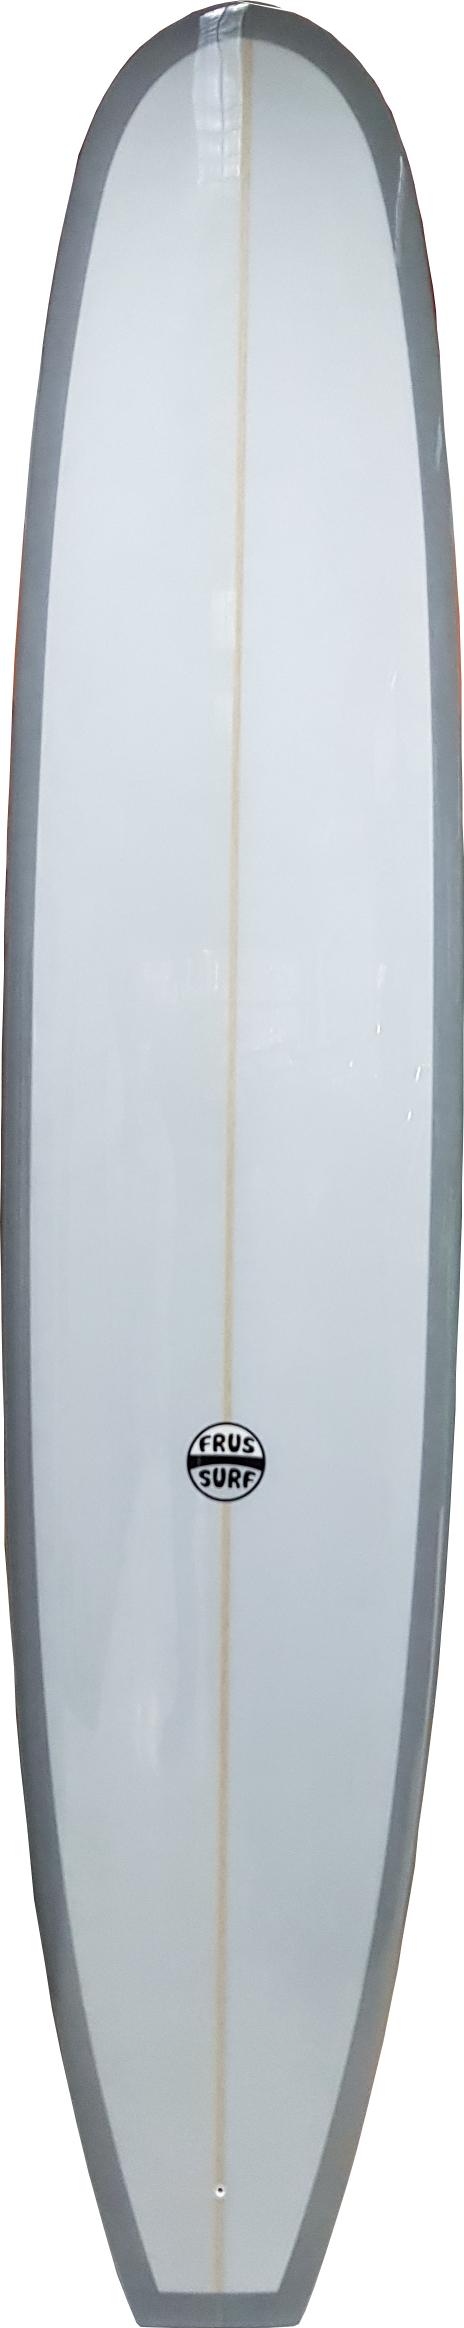 "Longboard Clásico FrusSurf 9'6'' x 23 5/8"" x 3 1/16"" con brillo"